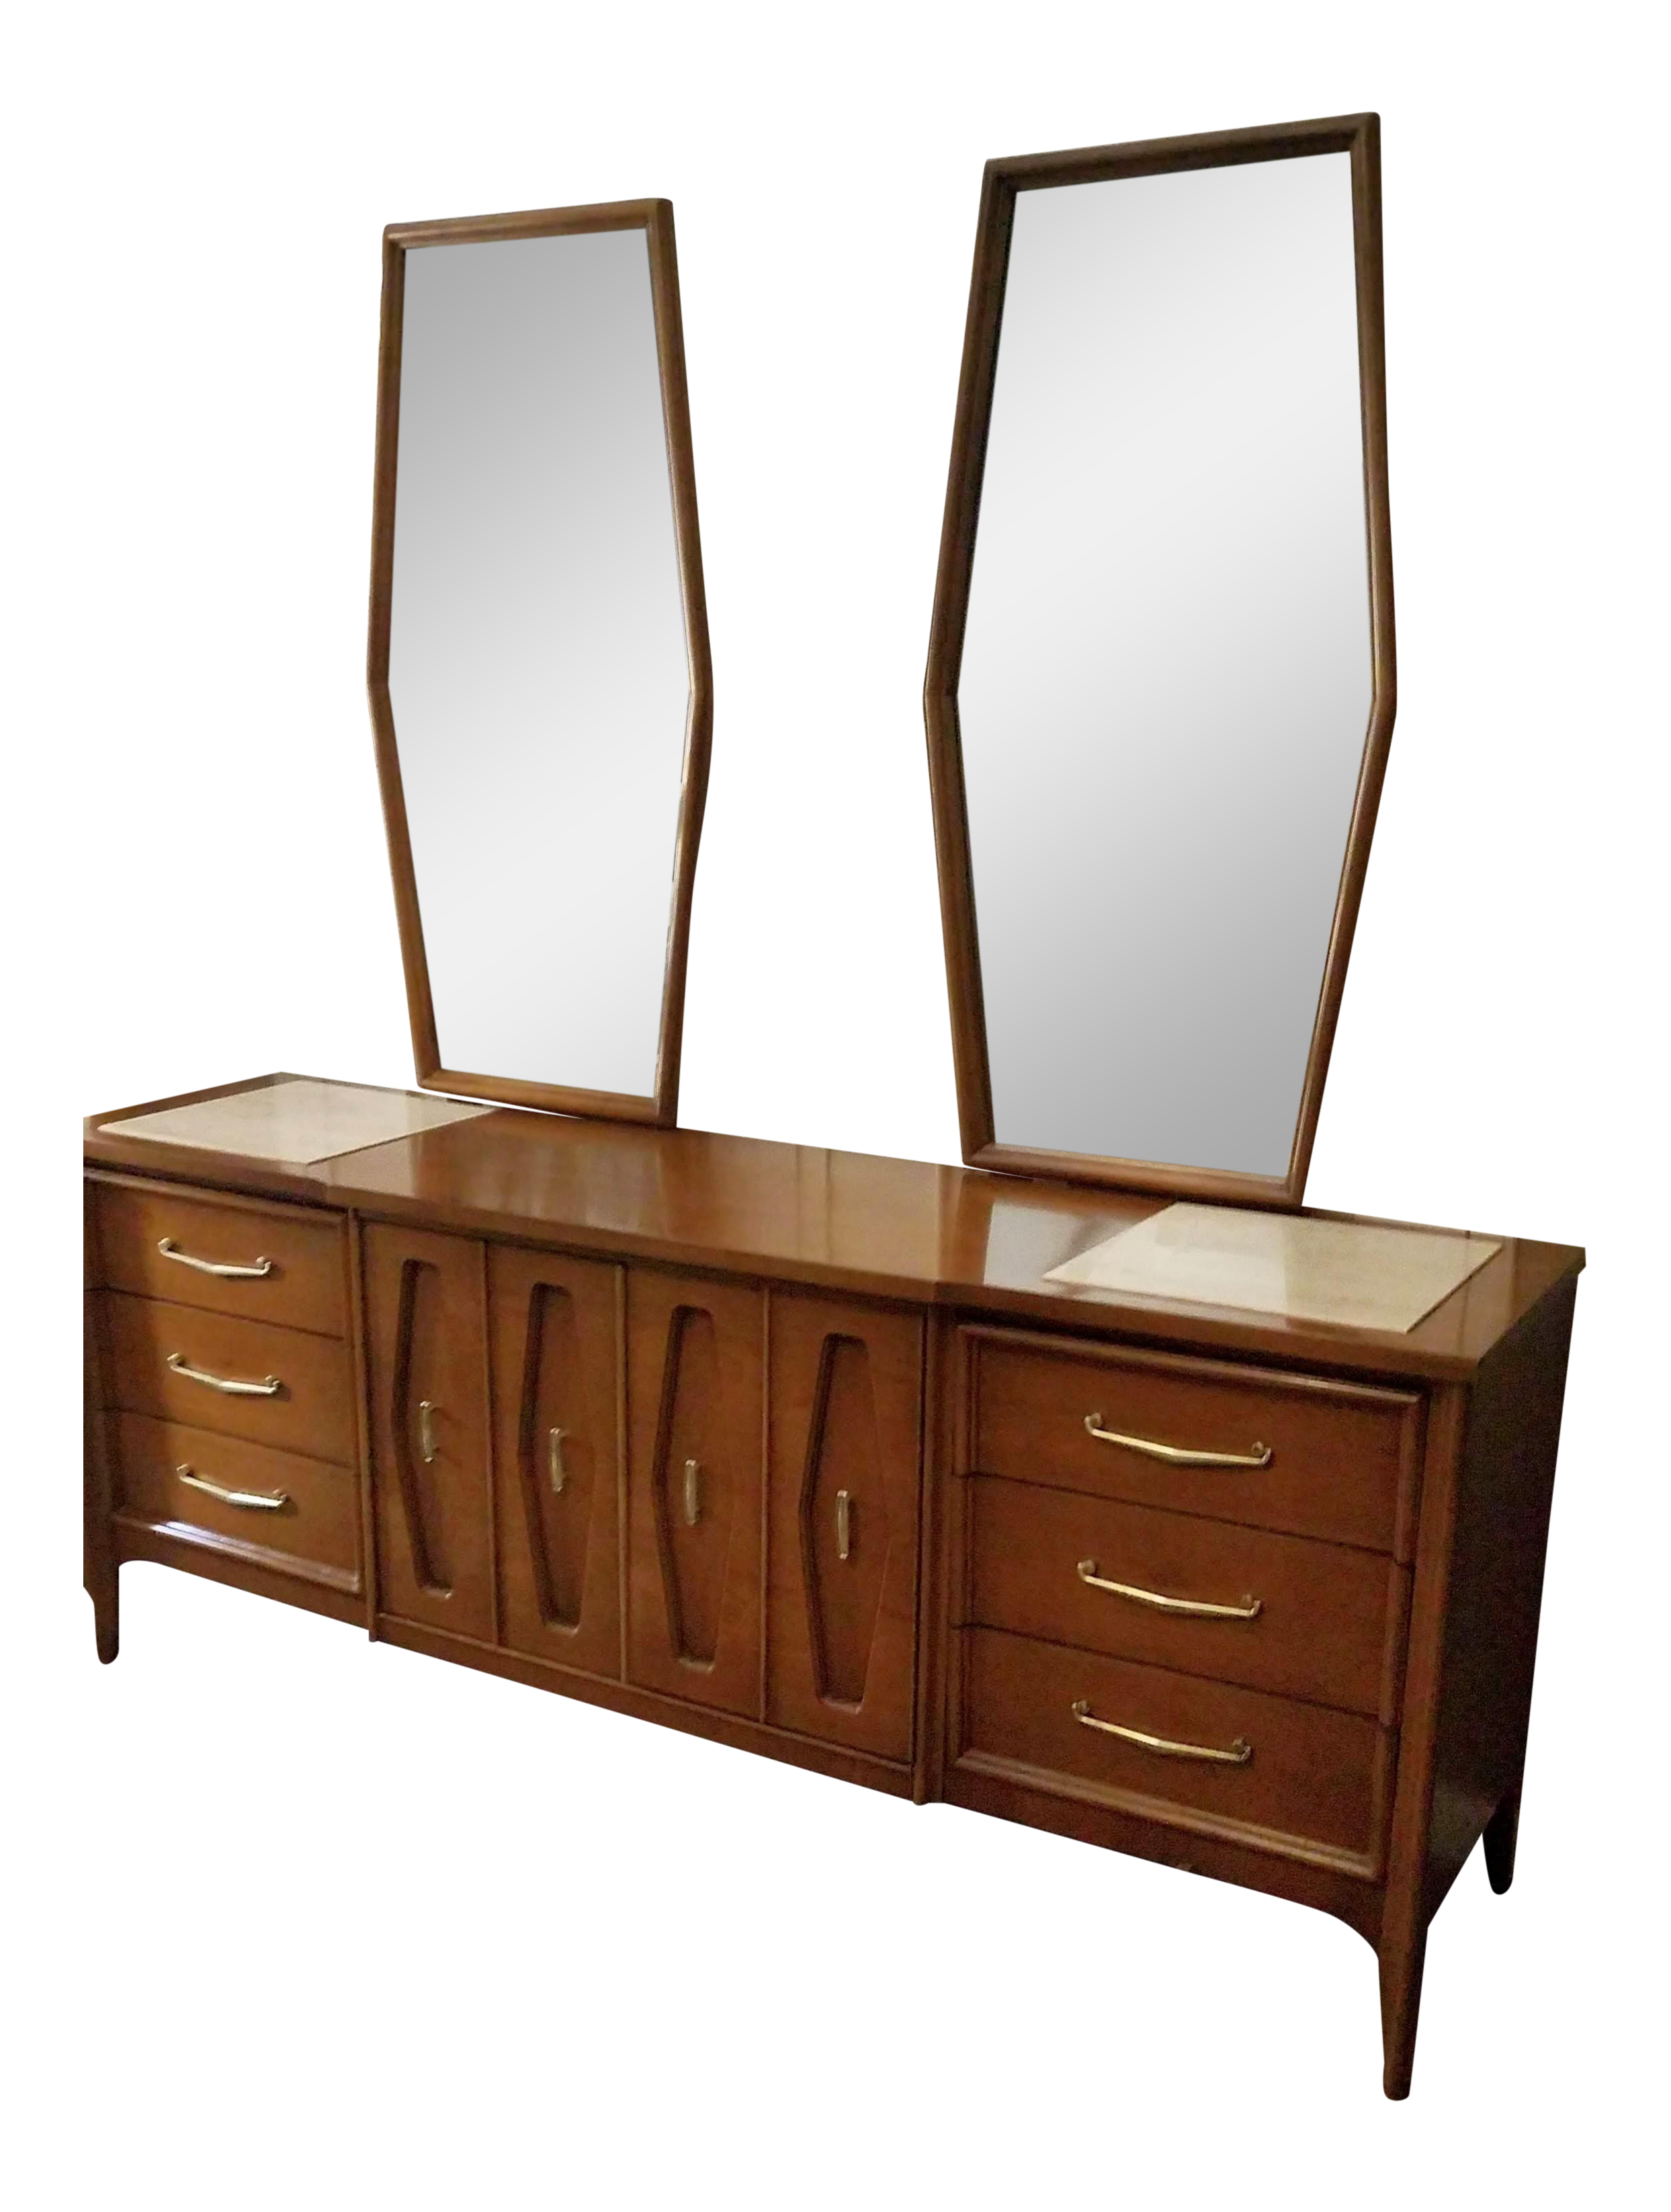 1957 Bassett Mid-Century Modern Long Dresser | Chairish